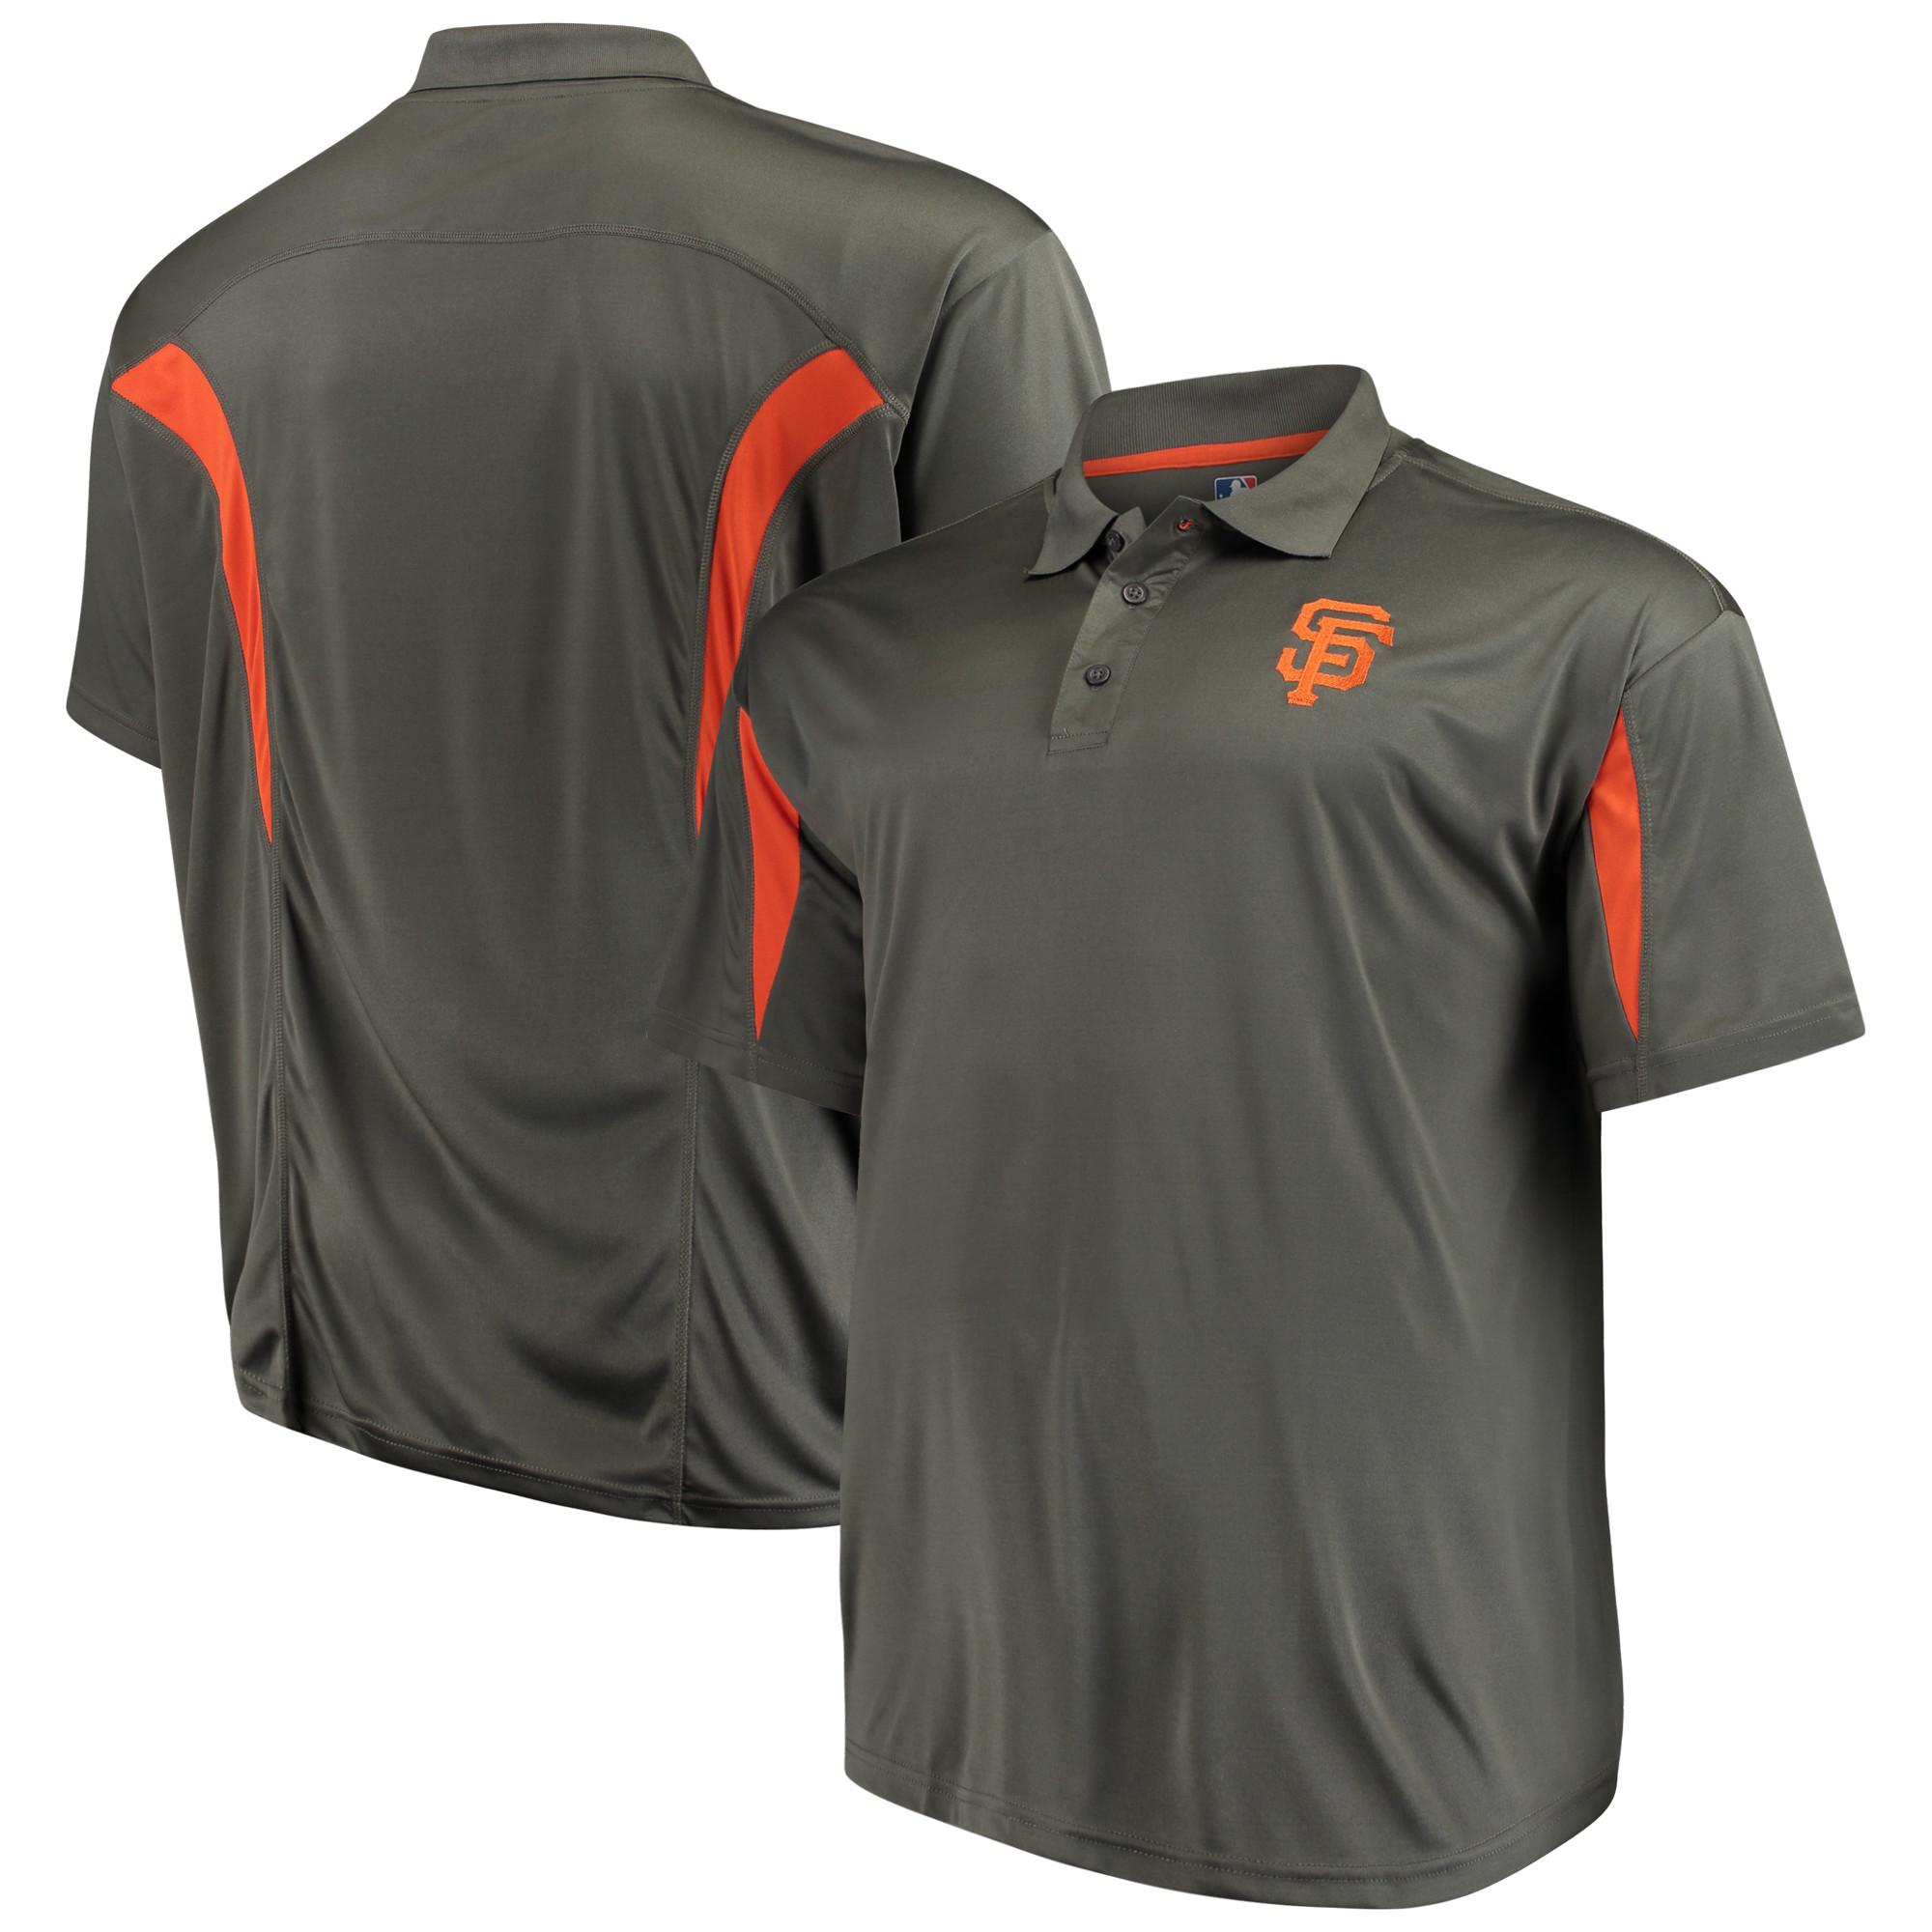 San Francisco Giants Majestic Contract Polo - Charcoal/Orange